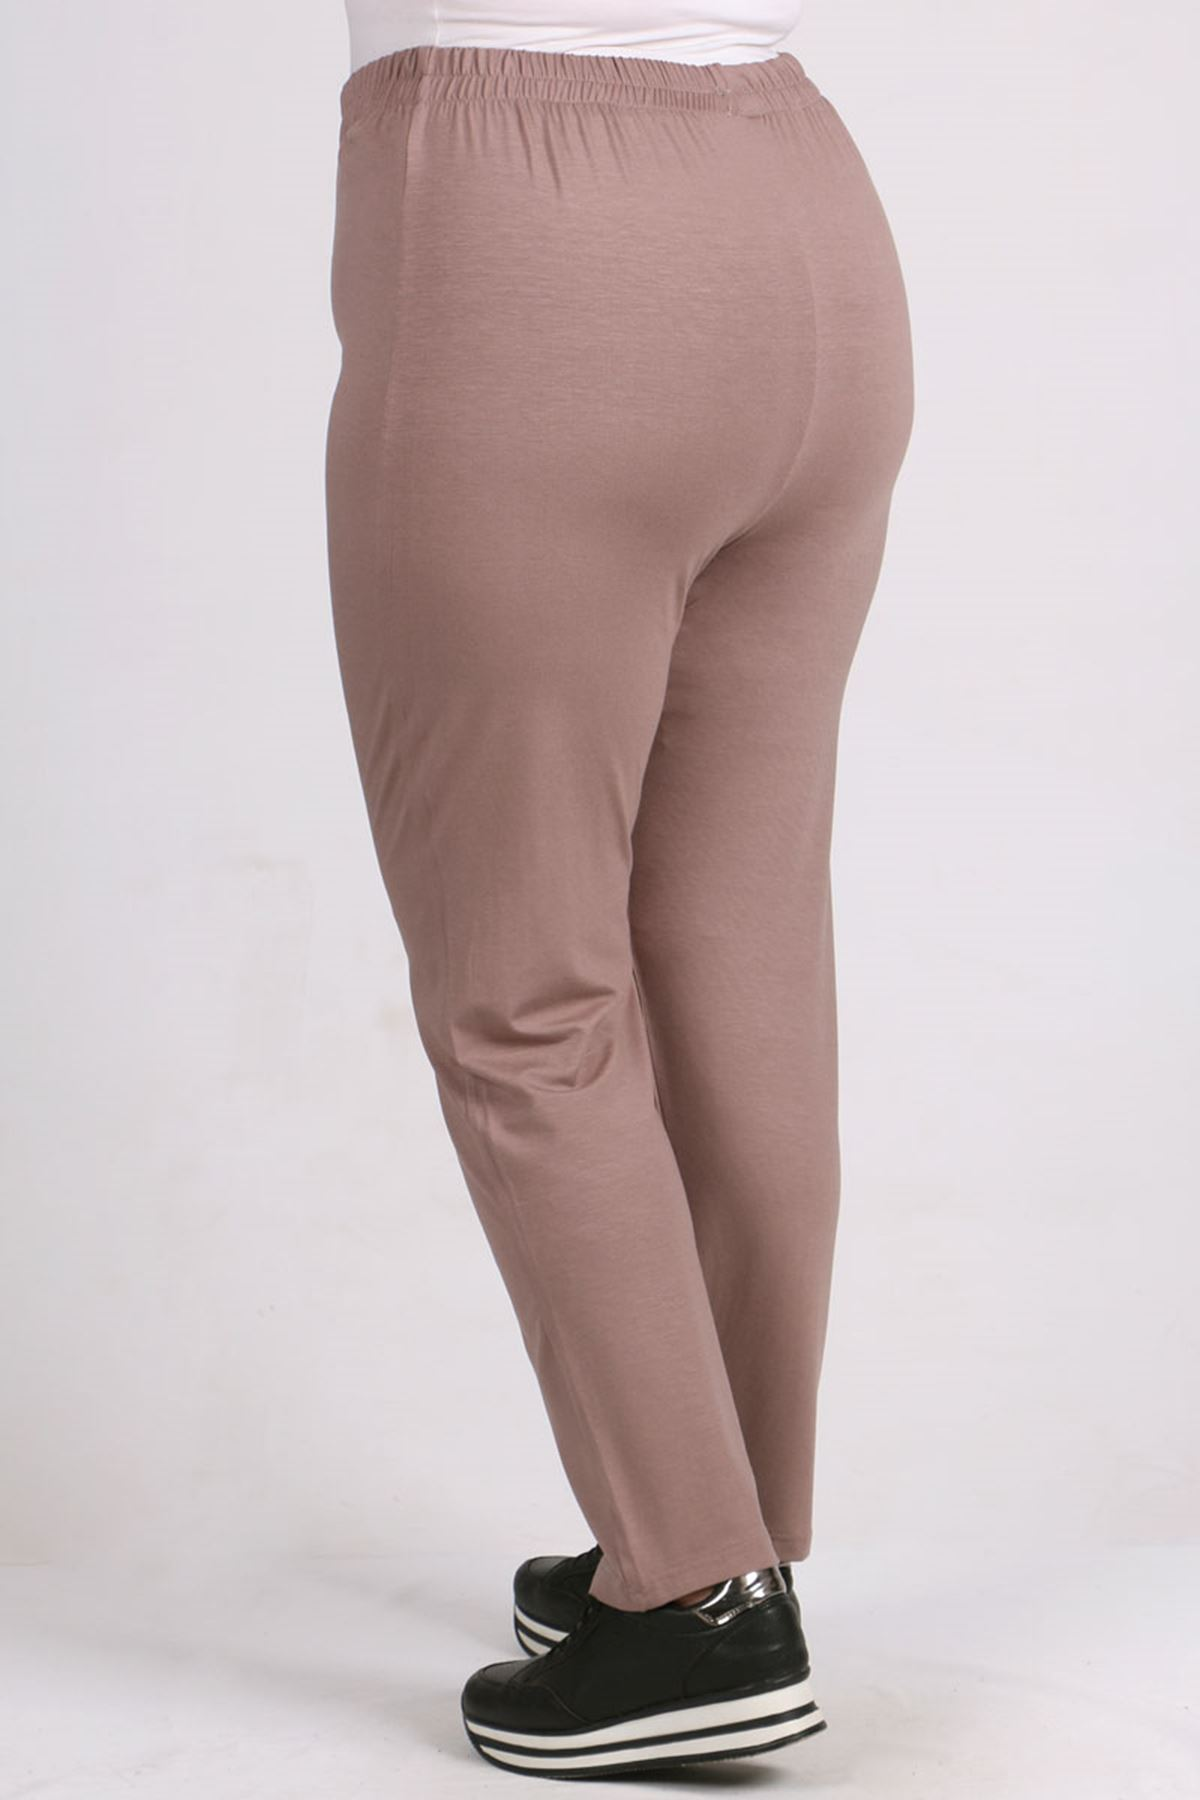 9057 Büyük Beden Yüksel Bel Lastikli Penye Pantalon -Vizon-1